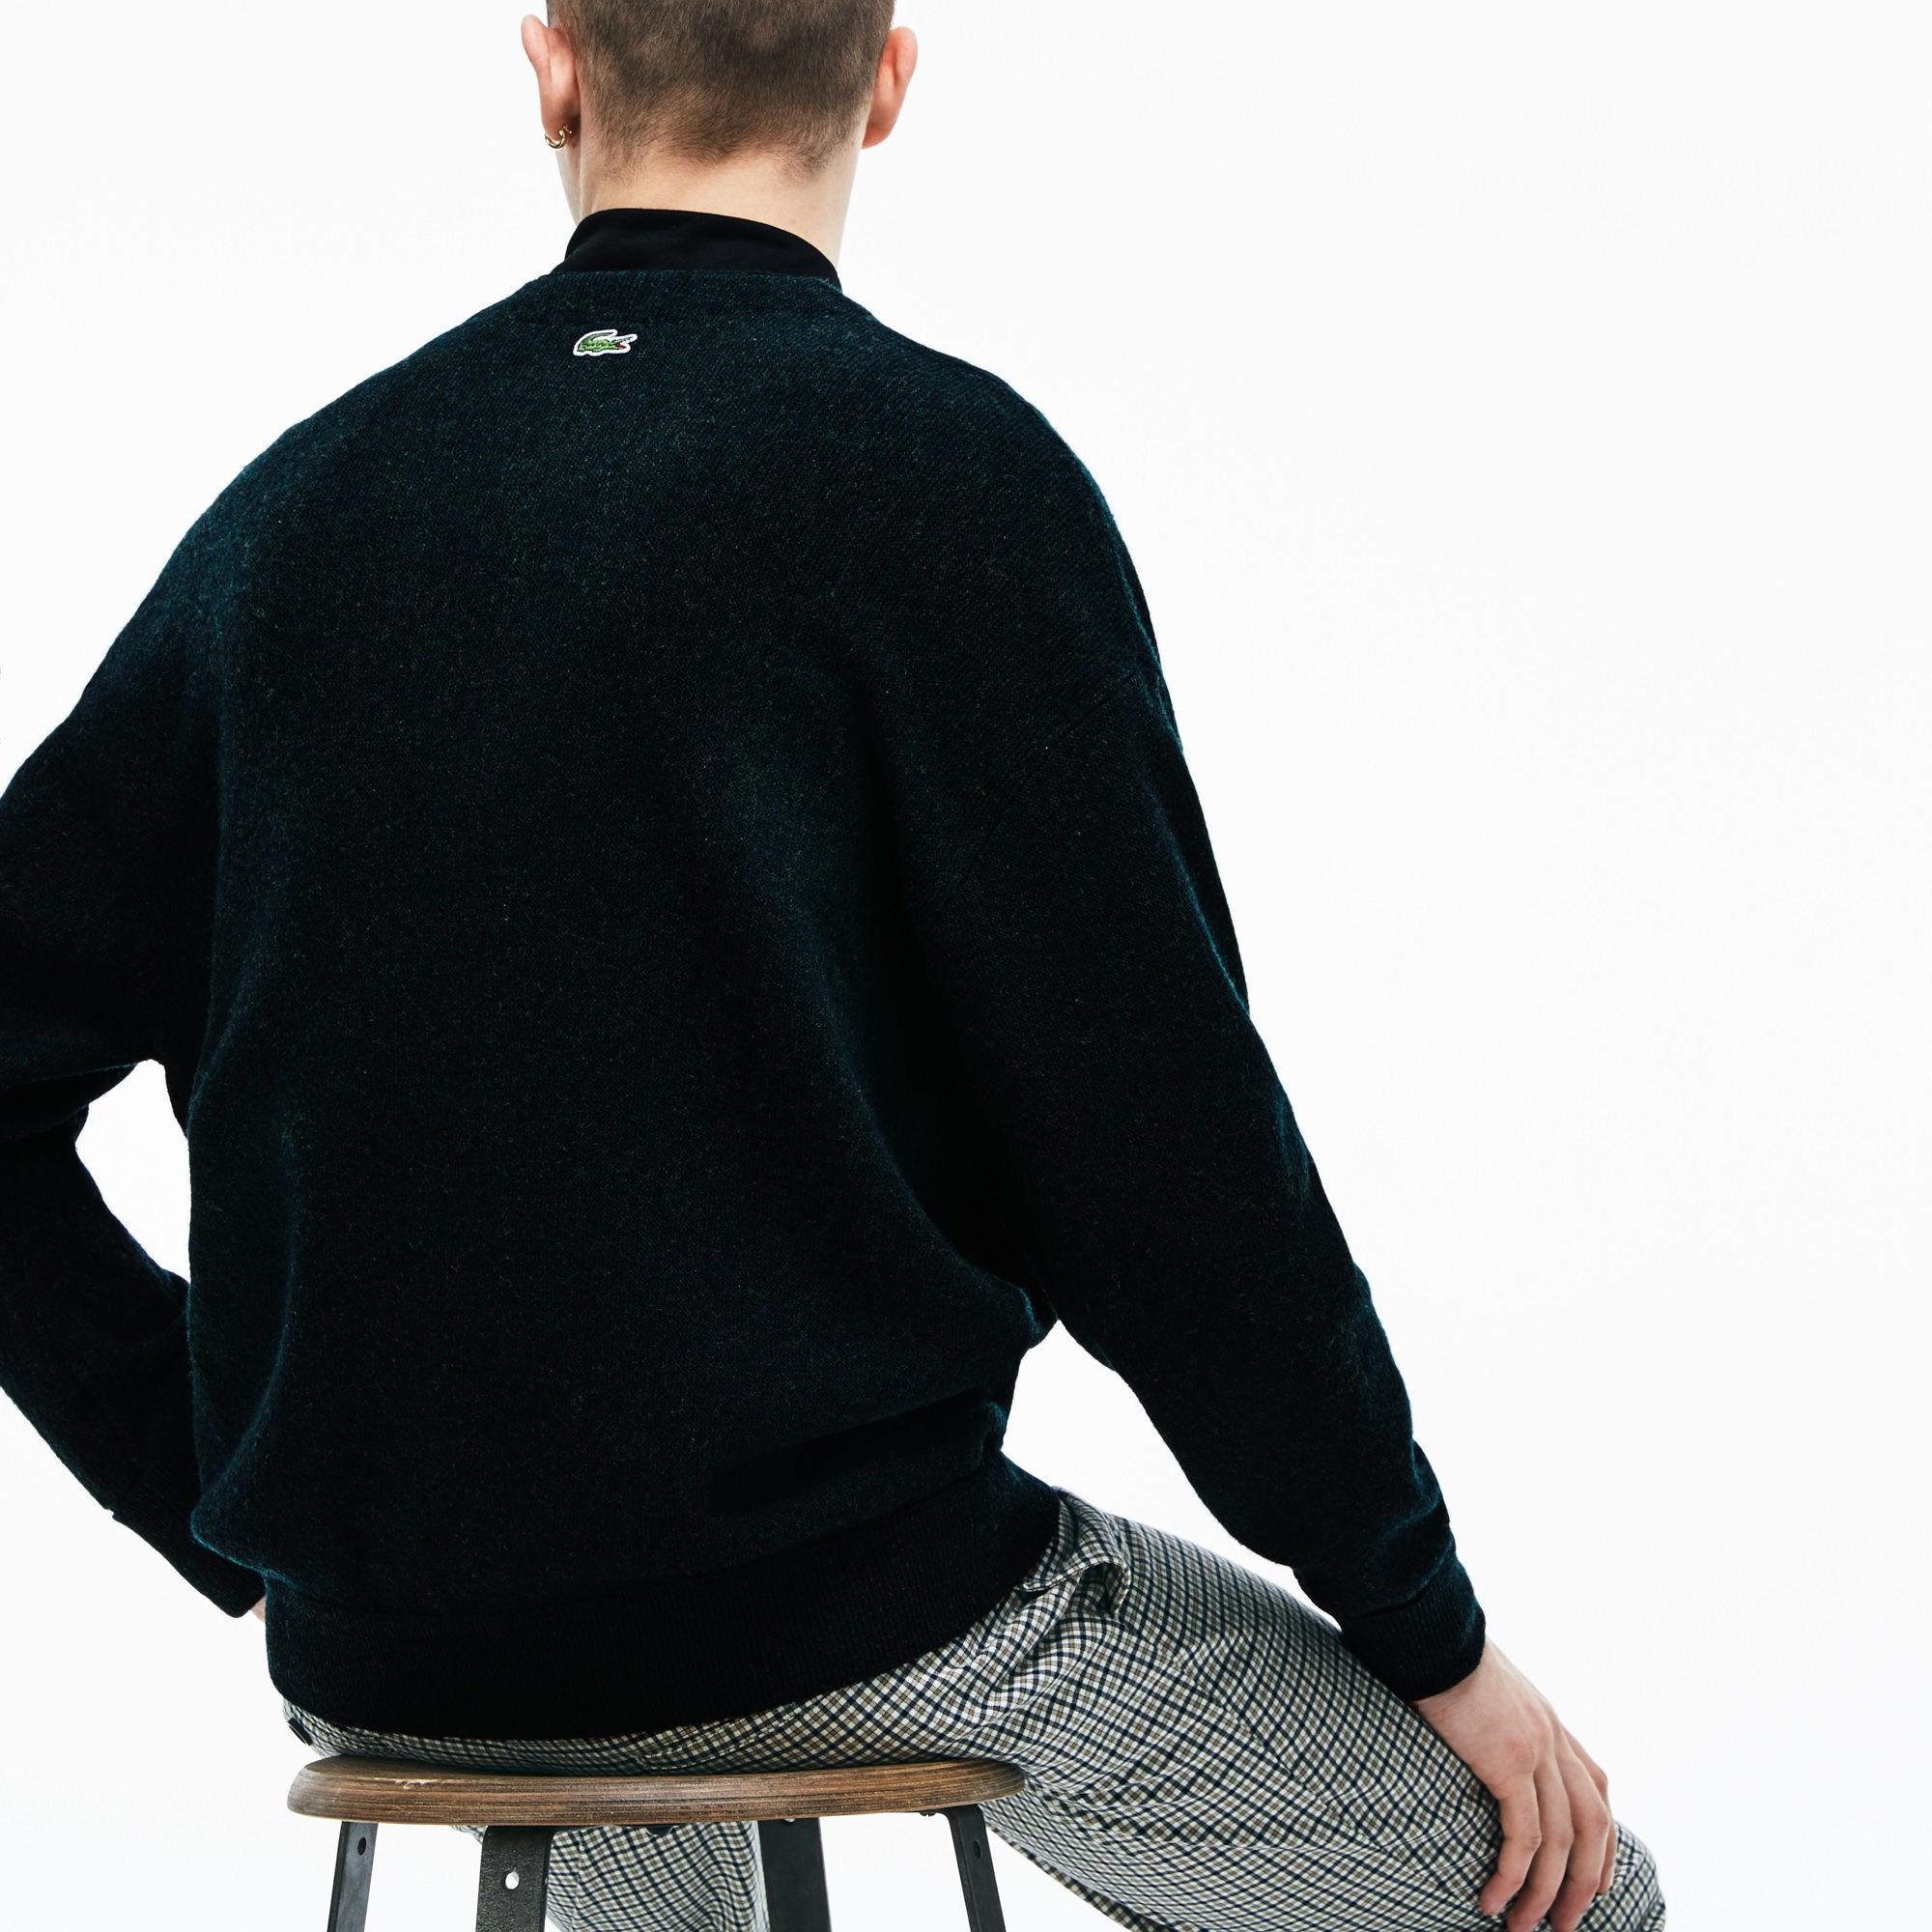 2da8bc037 Lacoste - Green Live Badge Wool Knit Cardigan for Men - Lyst. View  fullscreen